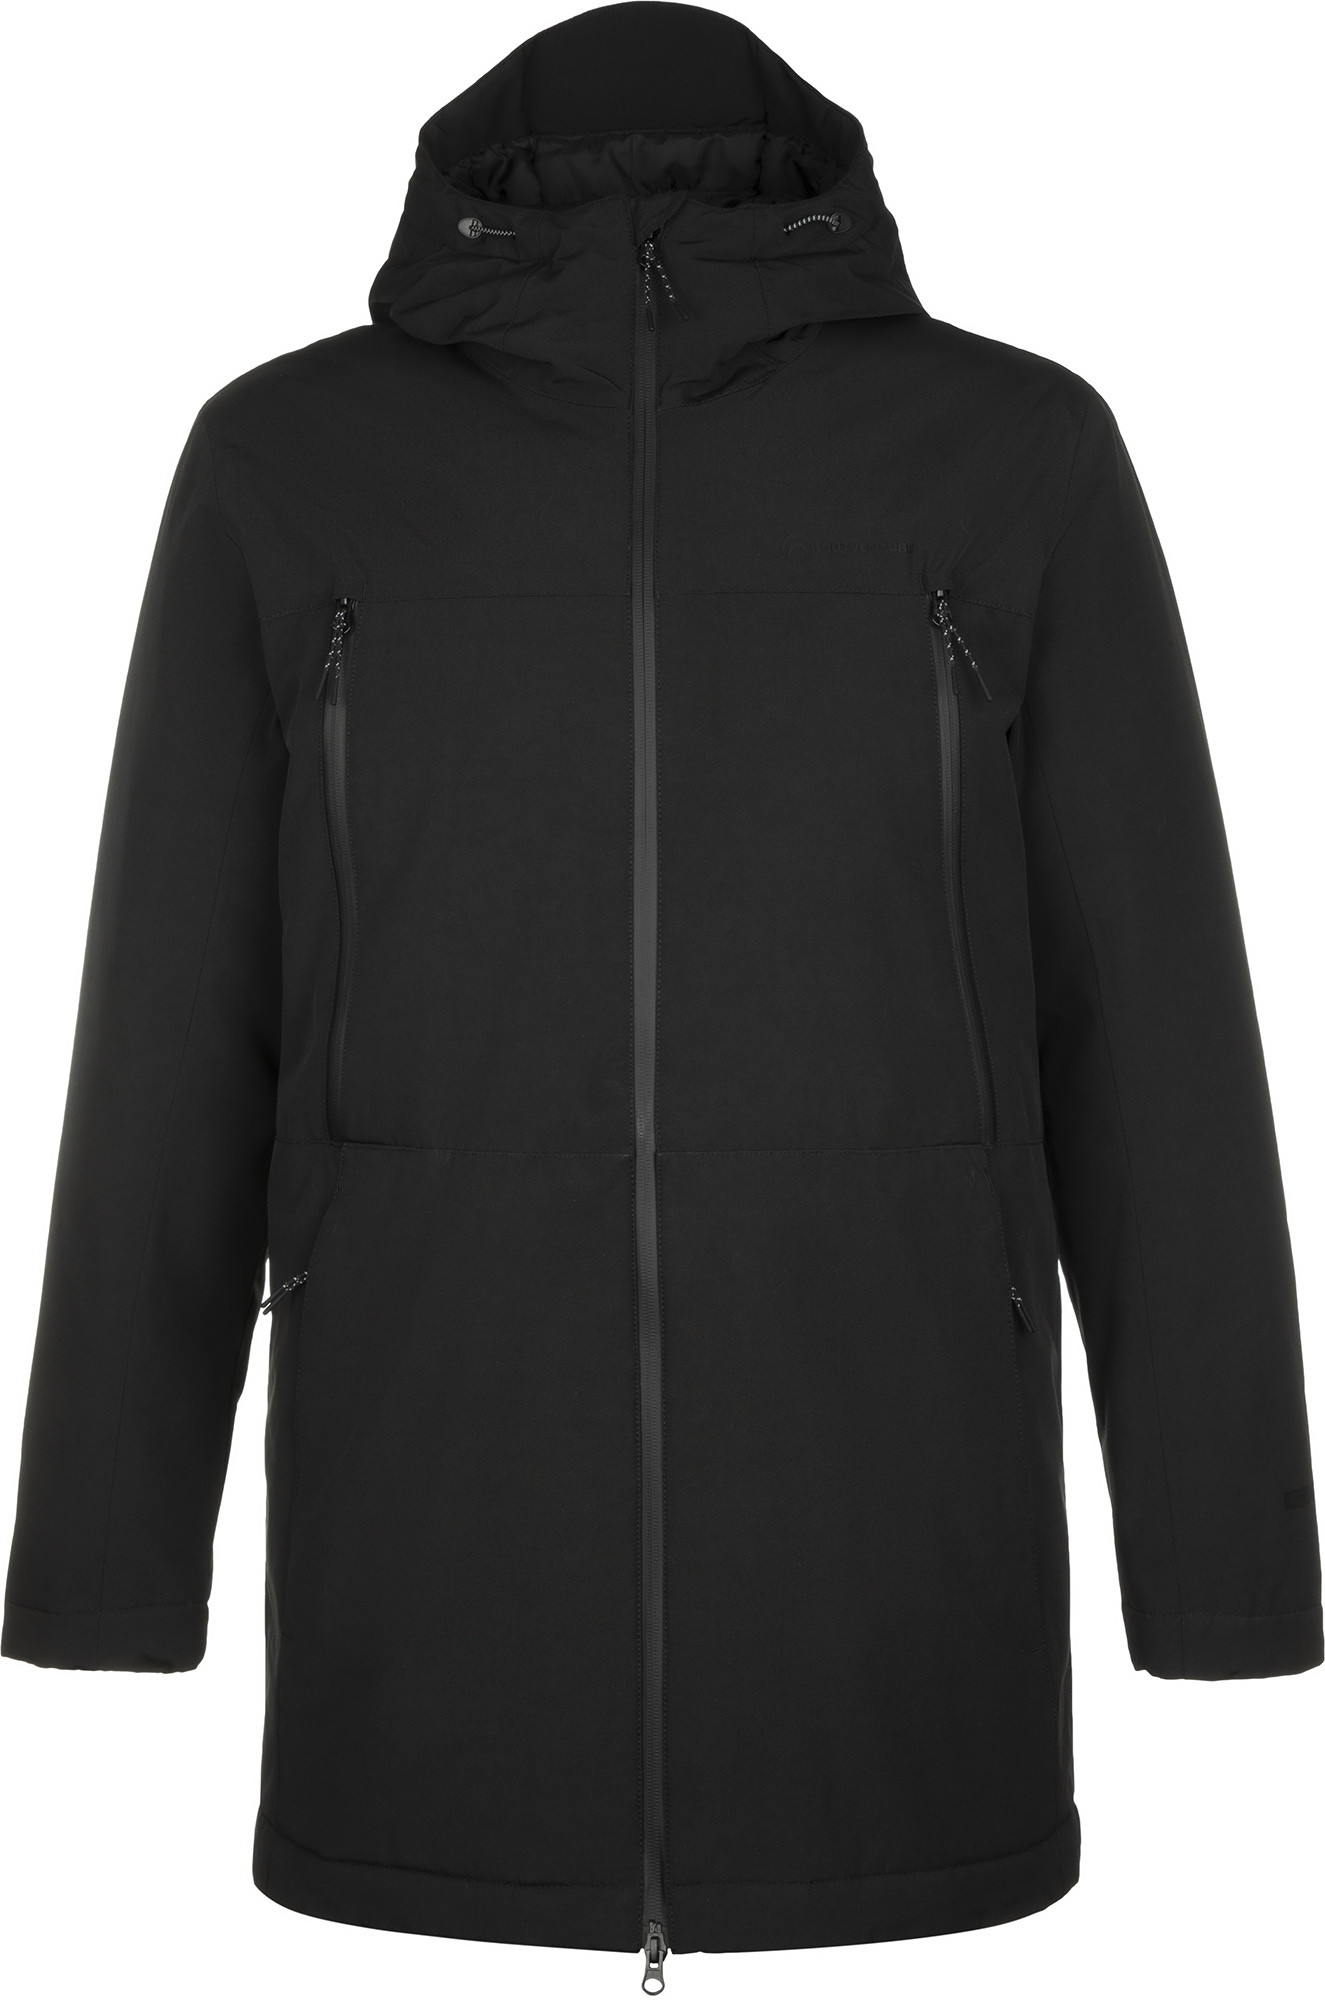 Outventure Куртка утепленная мужская Outventure, размер 58 куртка утепленная conso wear conso wear mp002xw0tupn